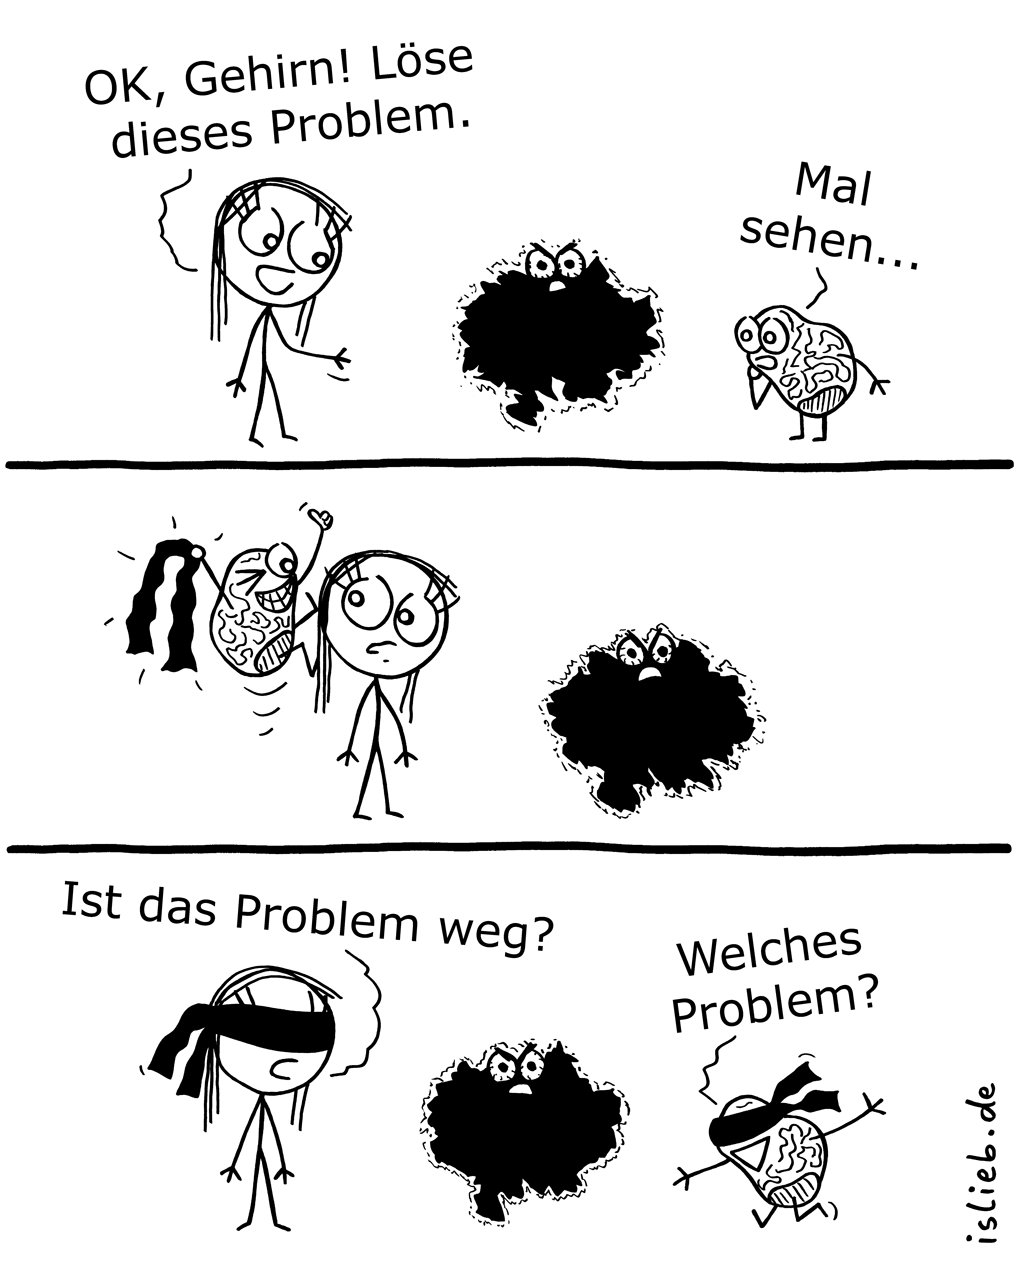 Problemlösung | Gehirn-Comic | is lieb?